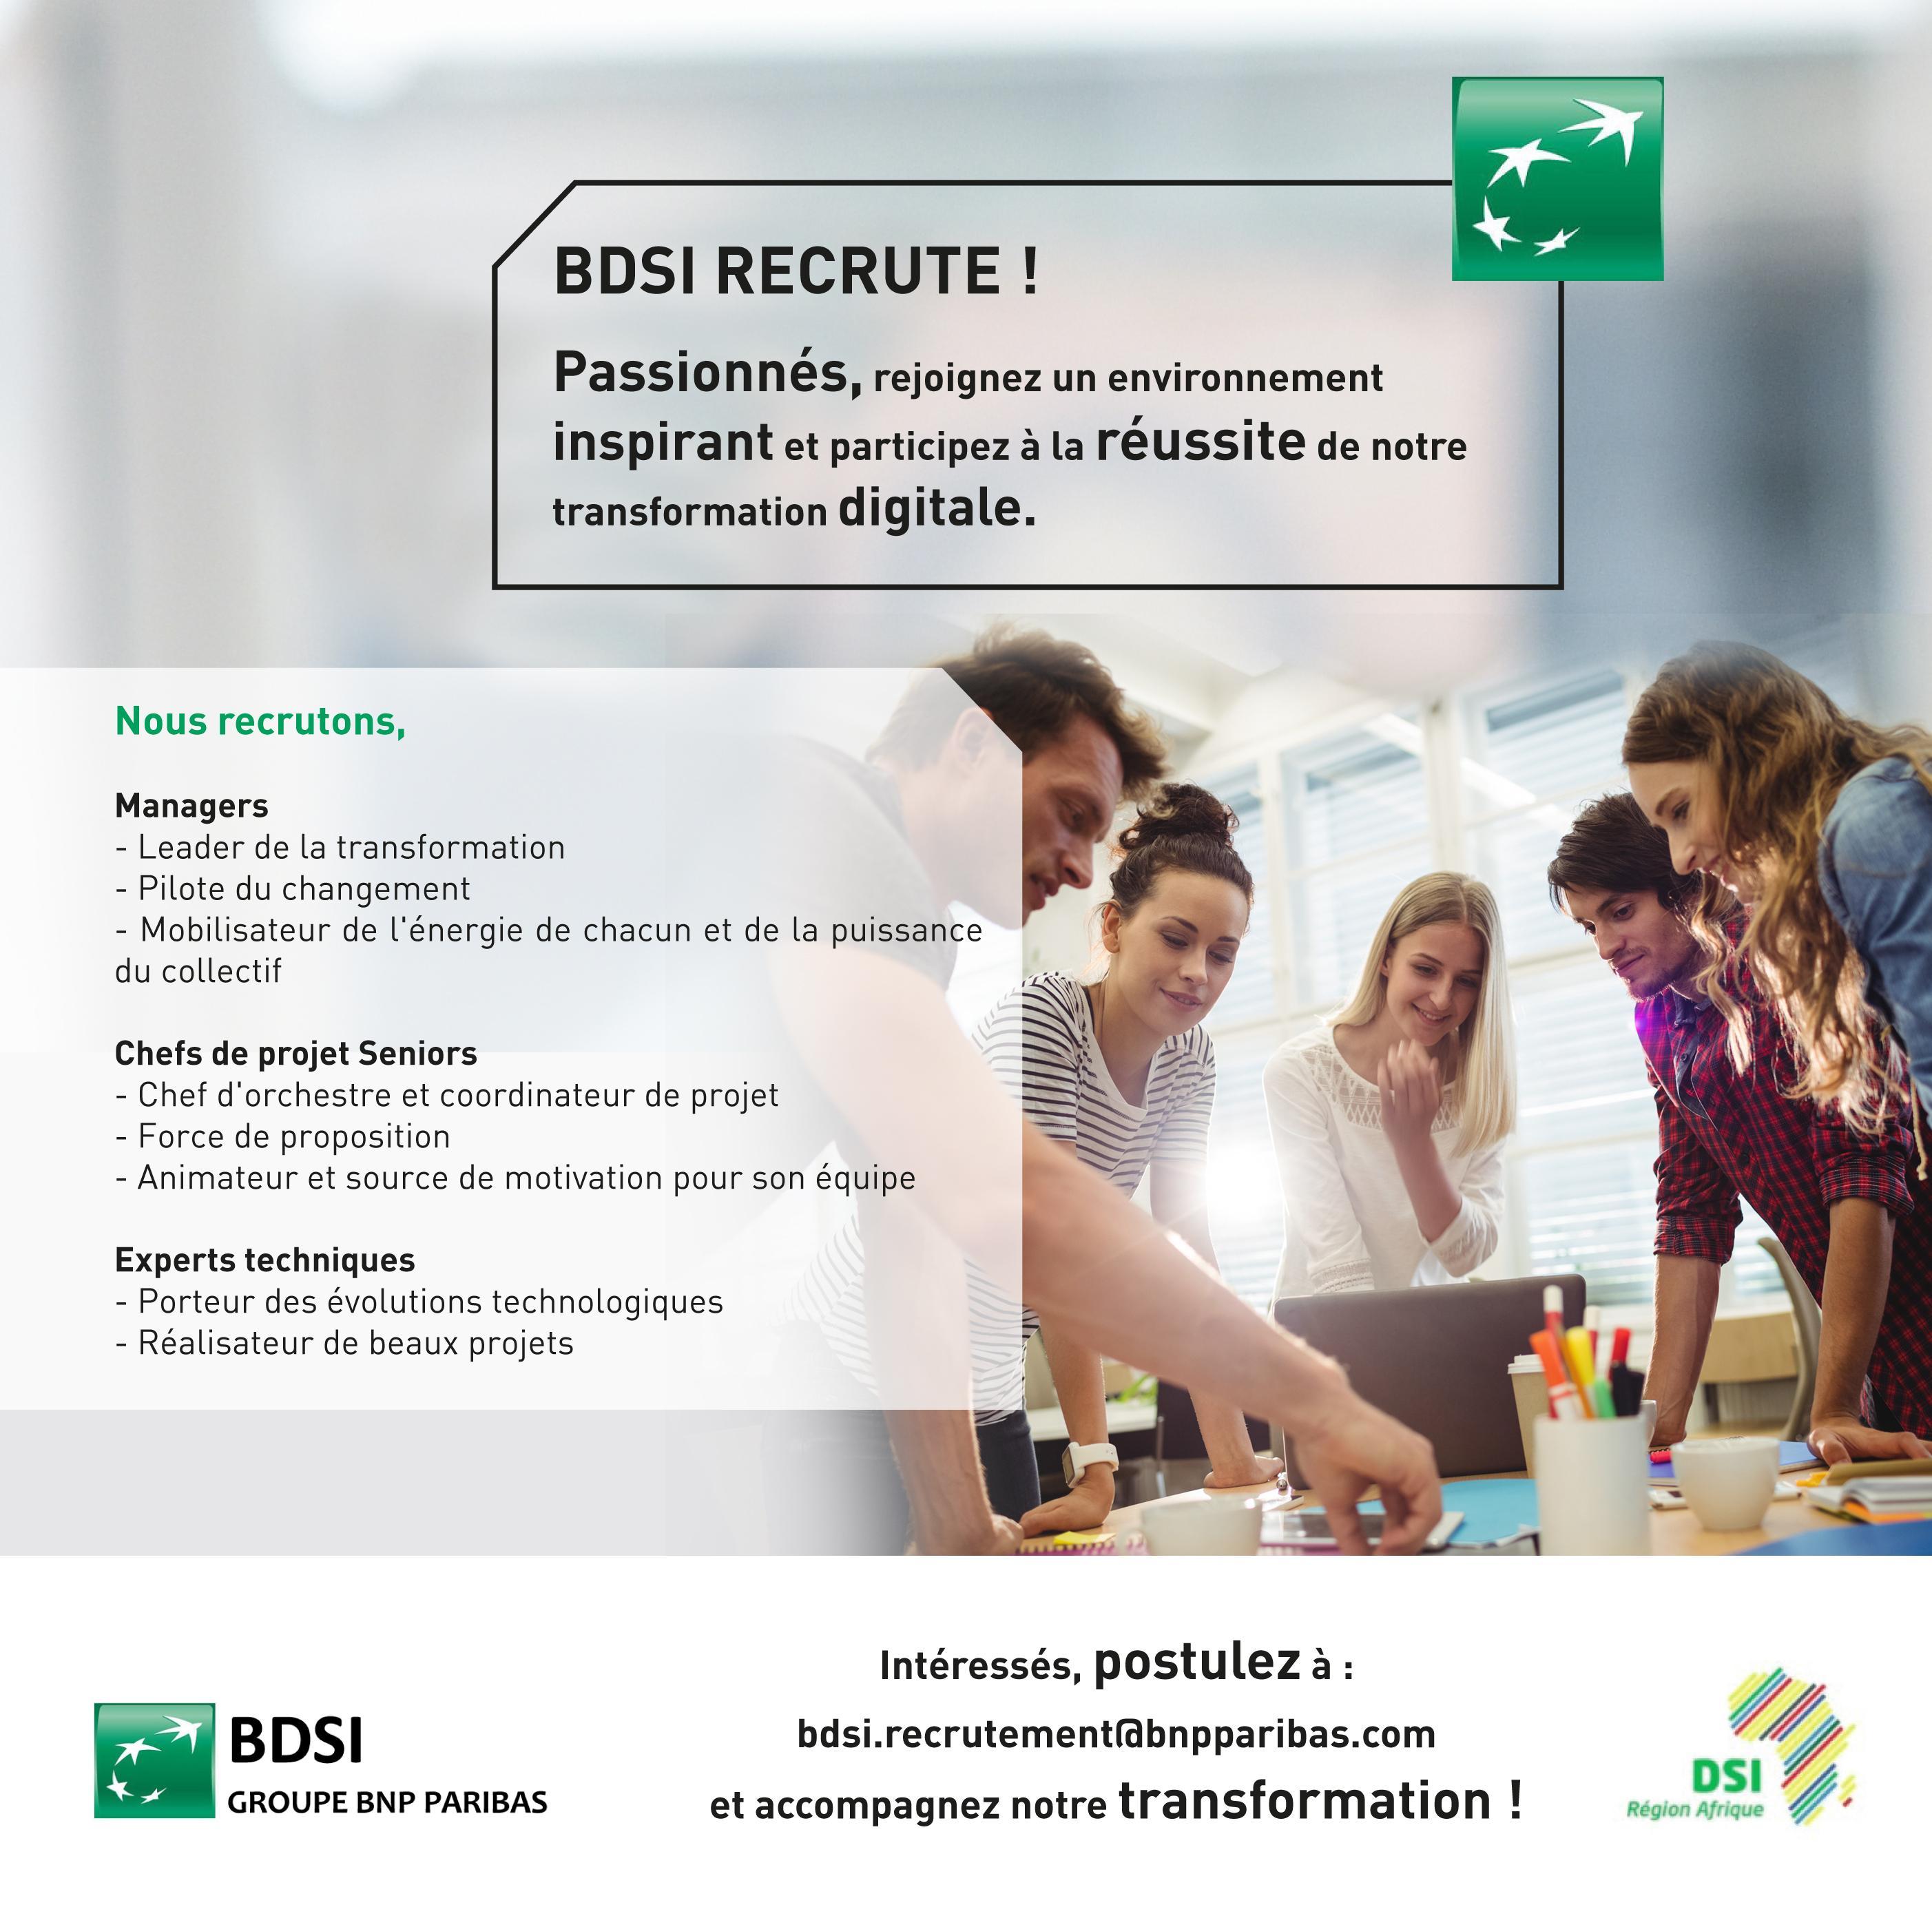 BDSI Recrutement - Dreamjob.ma